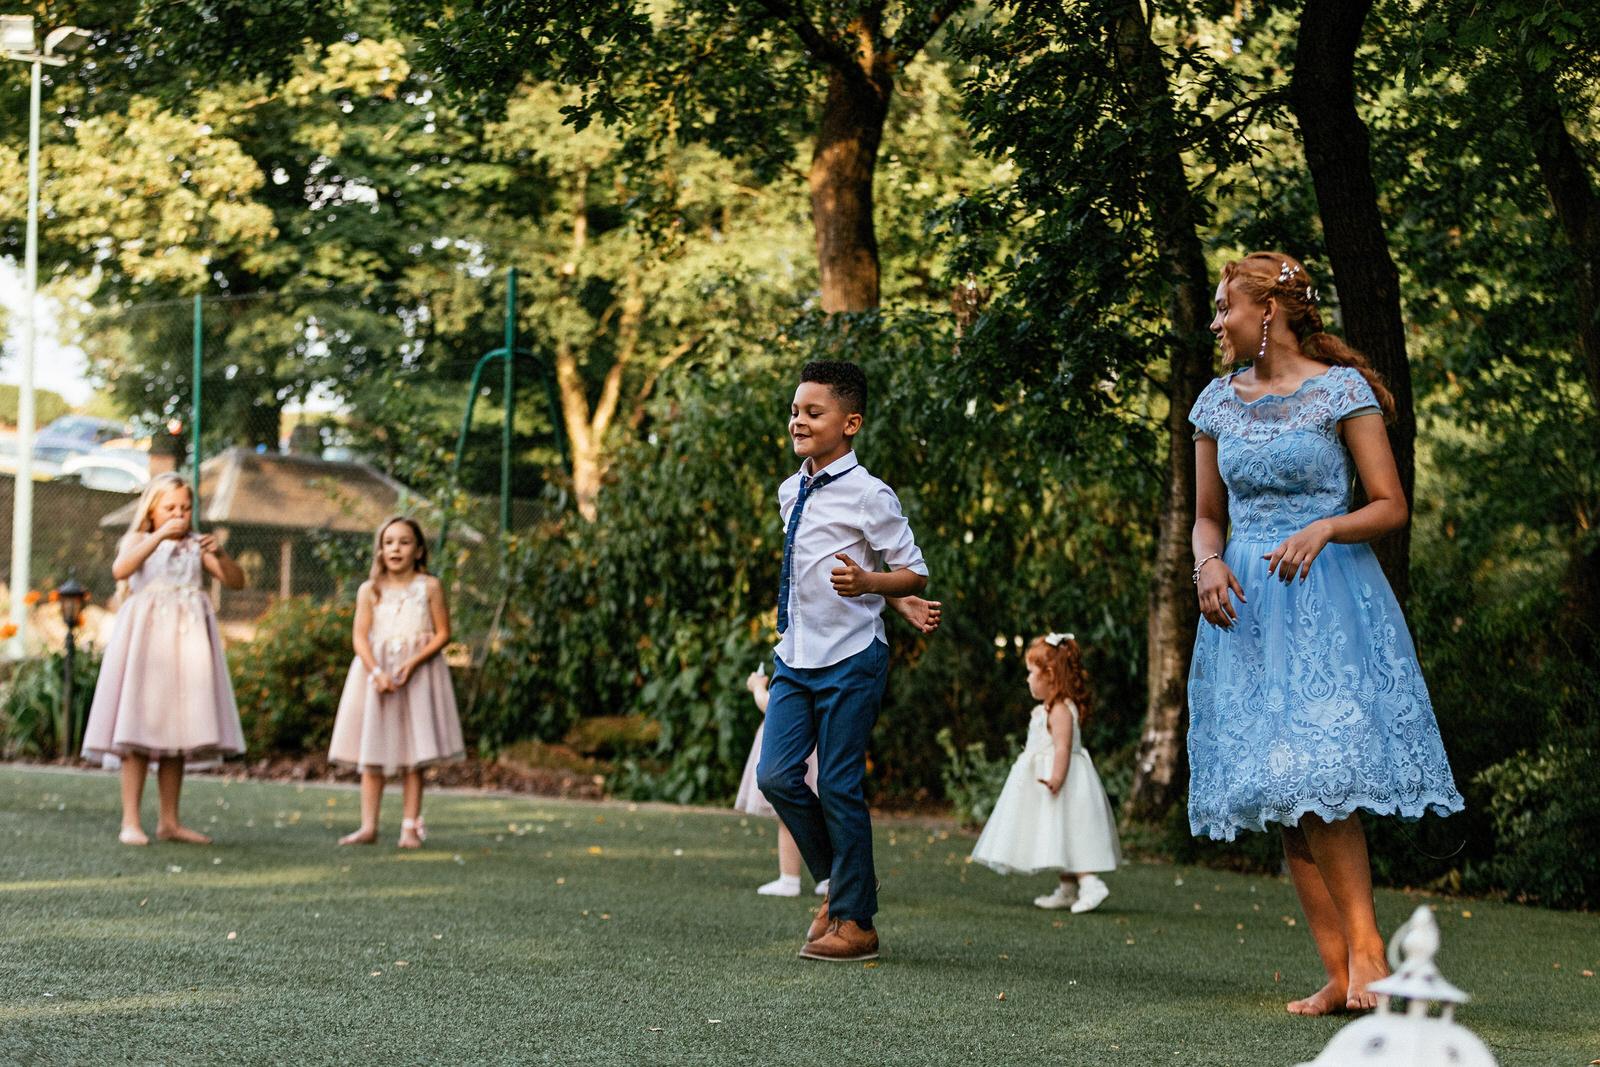 Moddershall-Oaks-Spa-Wedding-Photographer-065.jpg